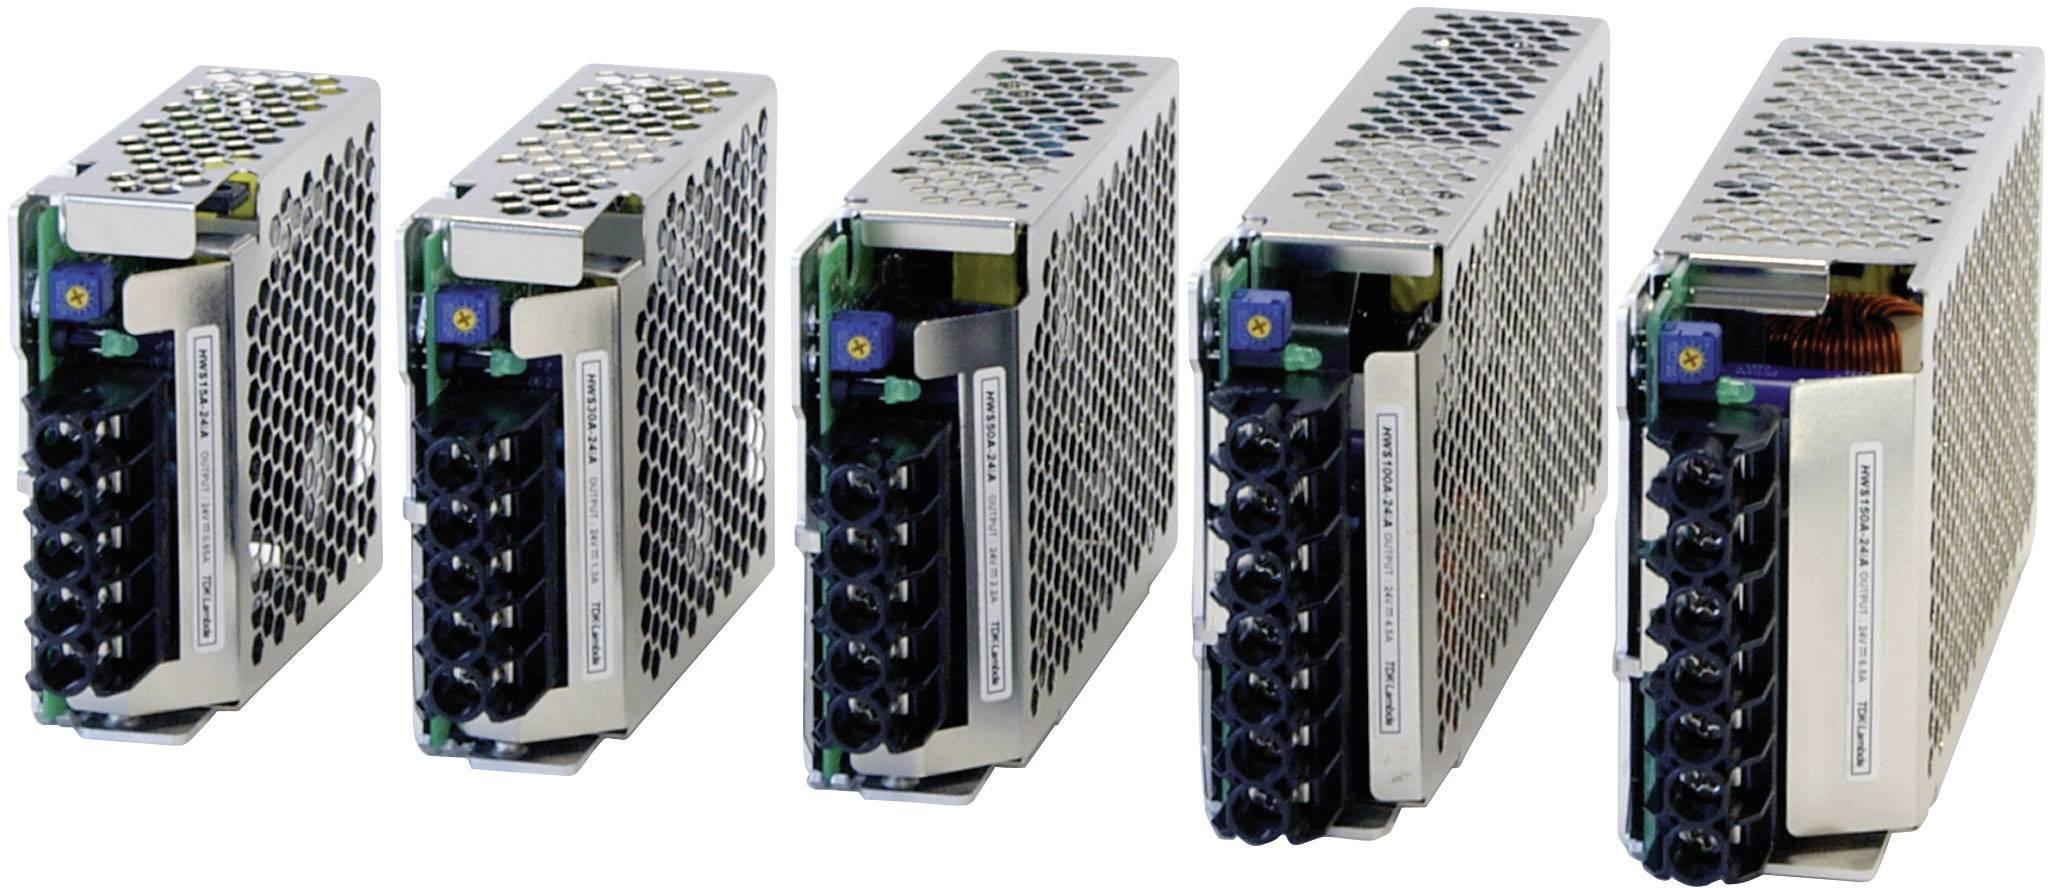 Zabudovateľný napájací zdroj TDK-Lambda HWS-15A-5, 5 V, 15 W